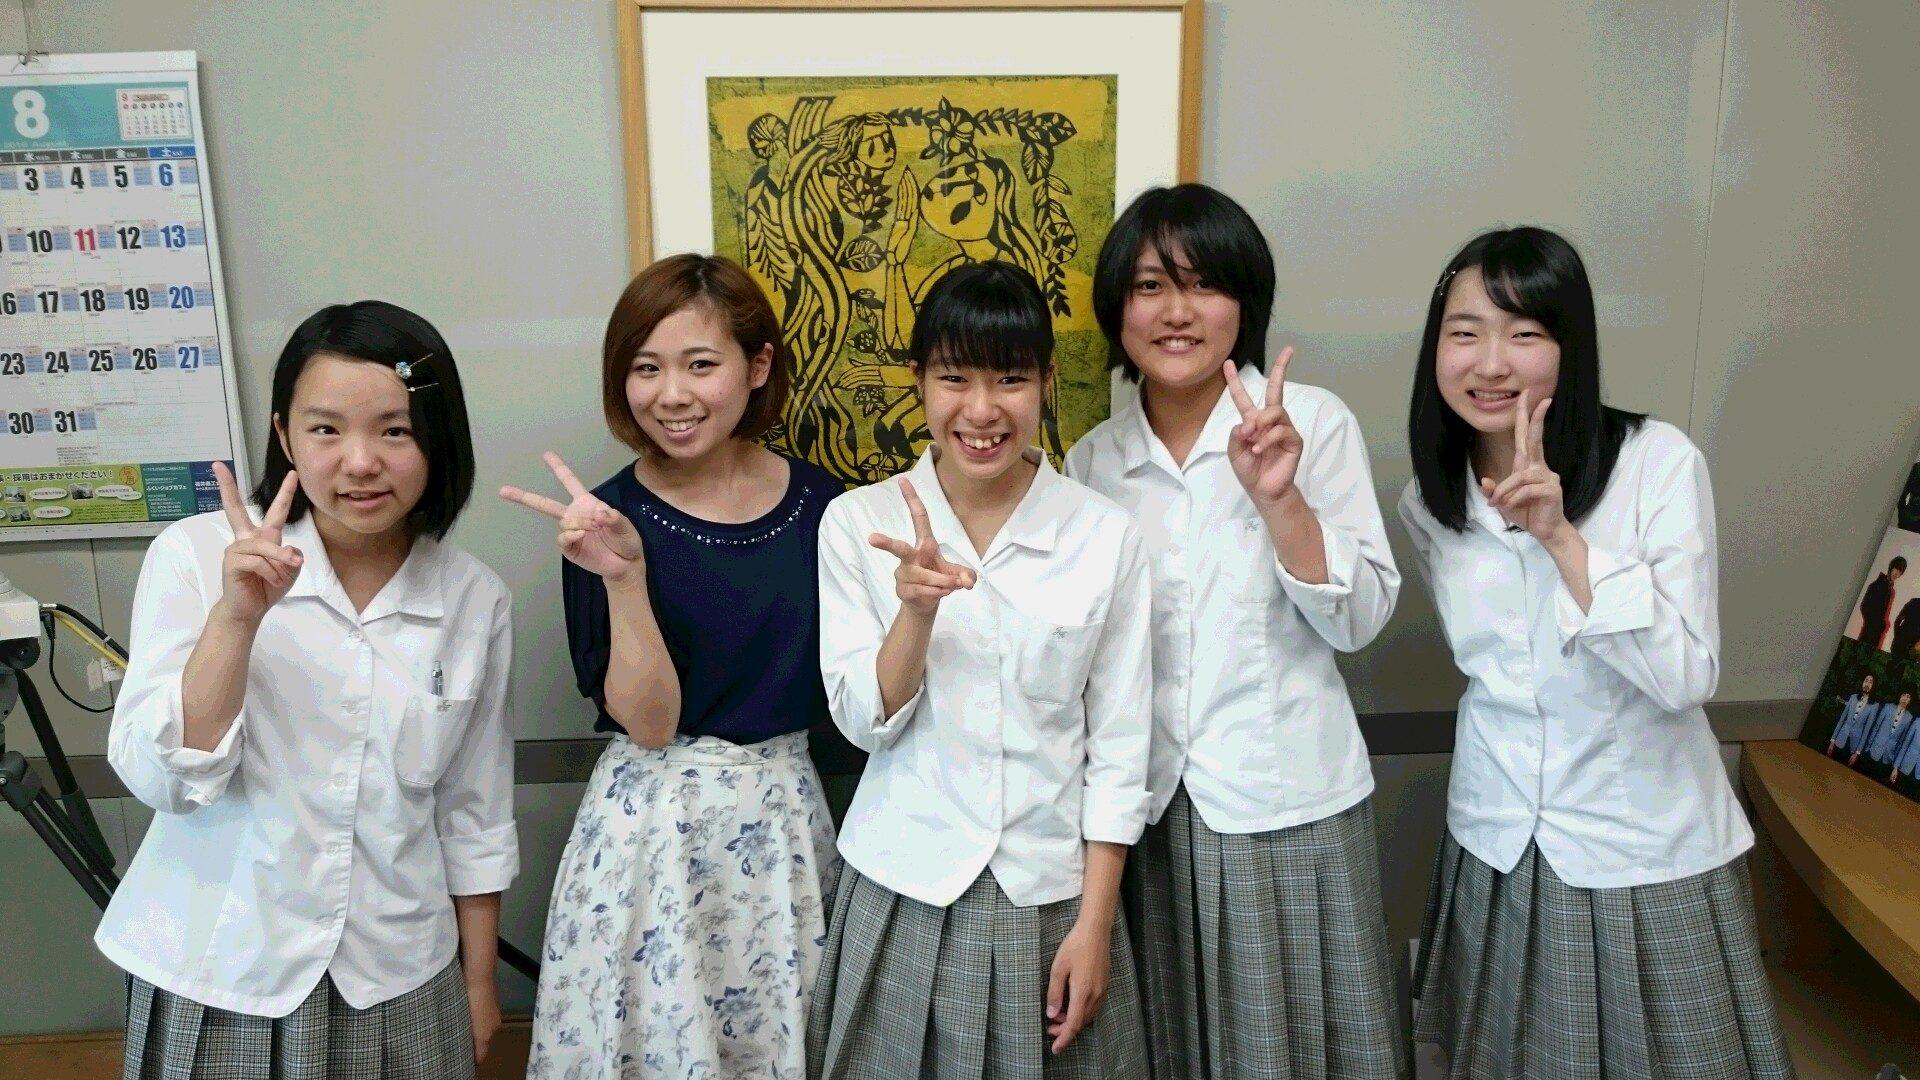 最強の夏!「Z」 – FM福井 76.1MHz JOLU-FM » 最強の夏Z 2016!2日目は ...